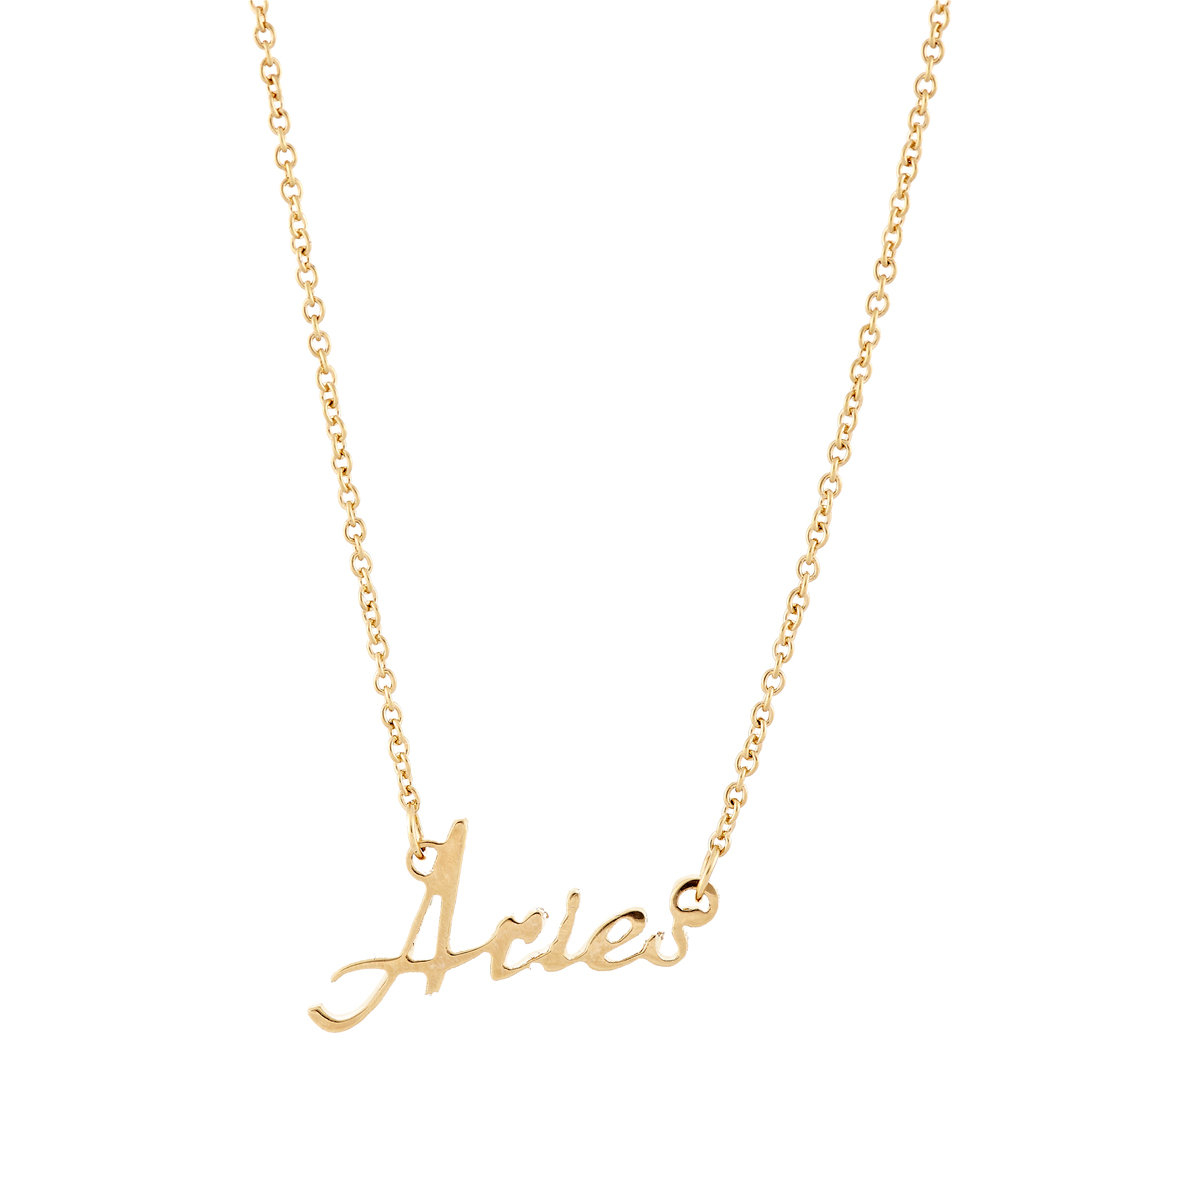 Lyst rebecca minkoff script aries pendant necklace in metallic gallery aloadofball Choice Image